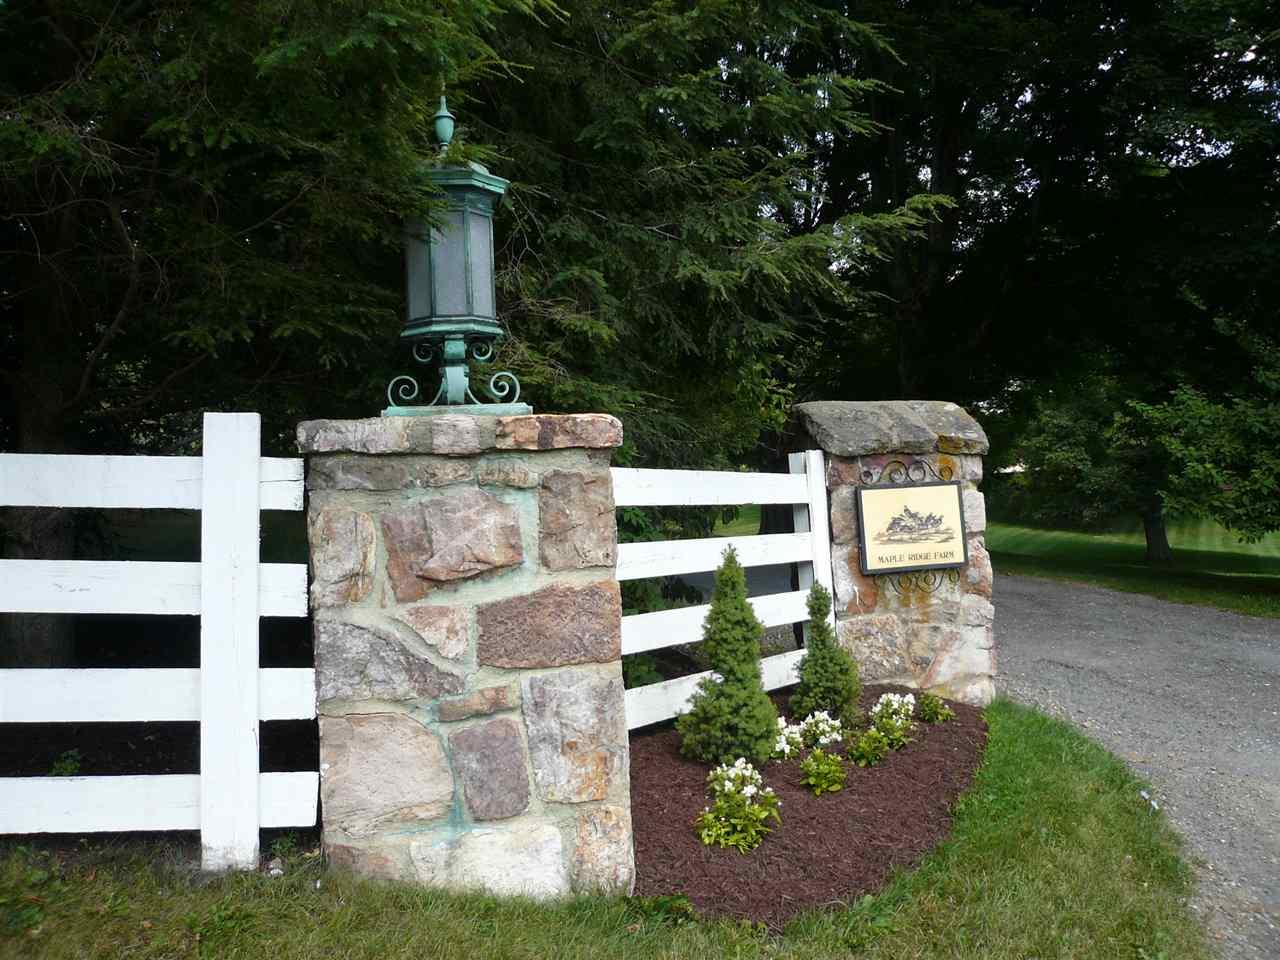 120 Maple Ridge Ln, Hot Springs, VA, 24445